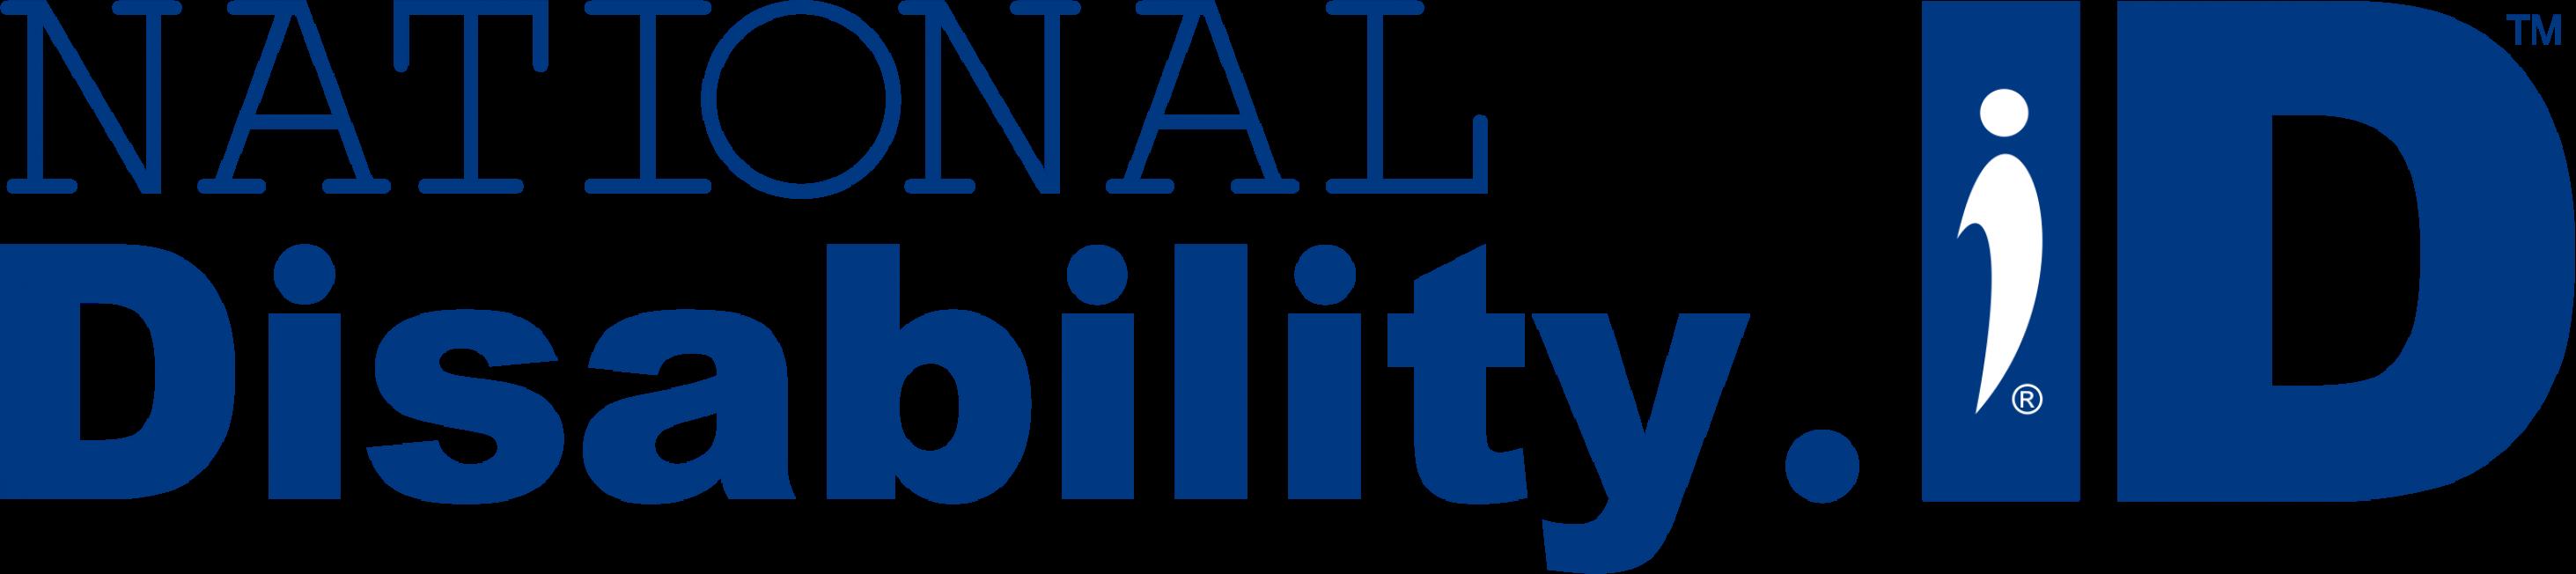 NationalDisability.ID Initiative - Invisible Disabilities Association